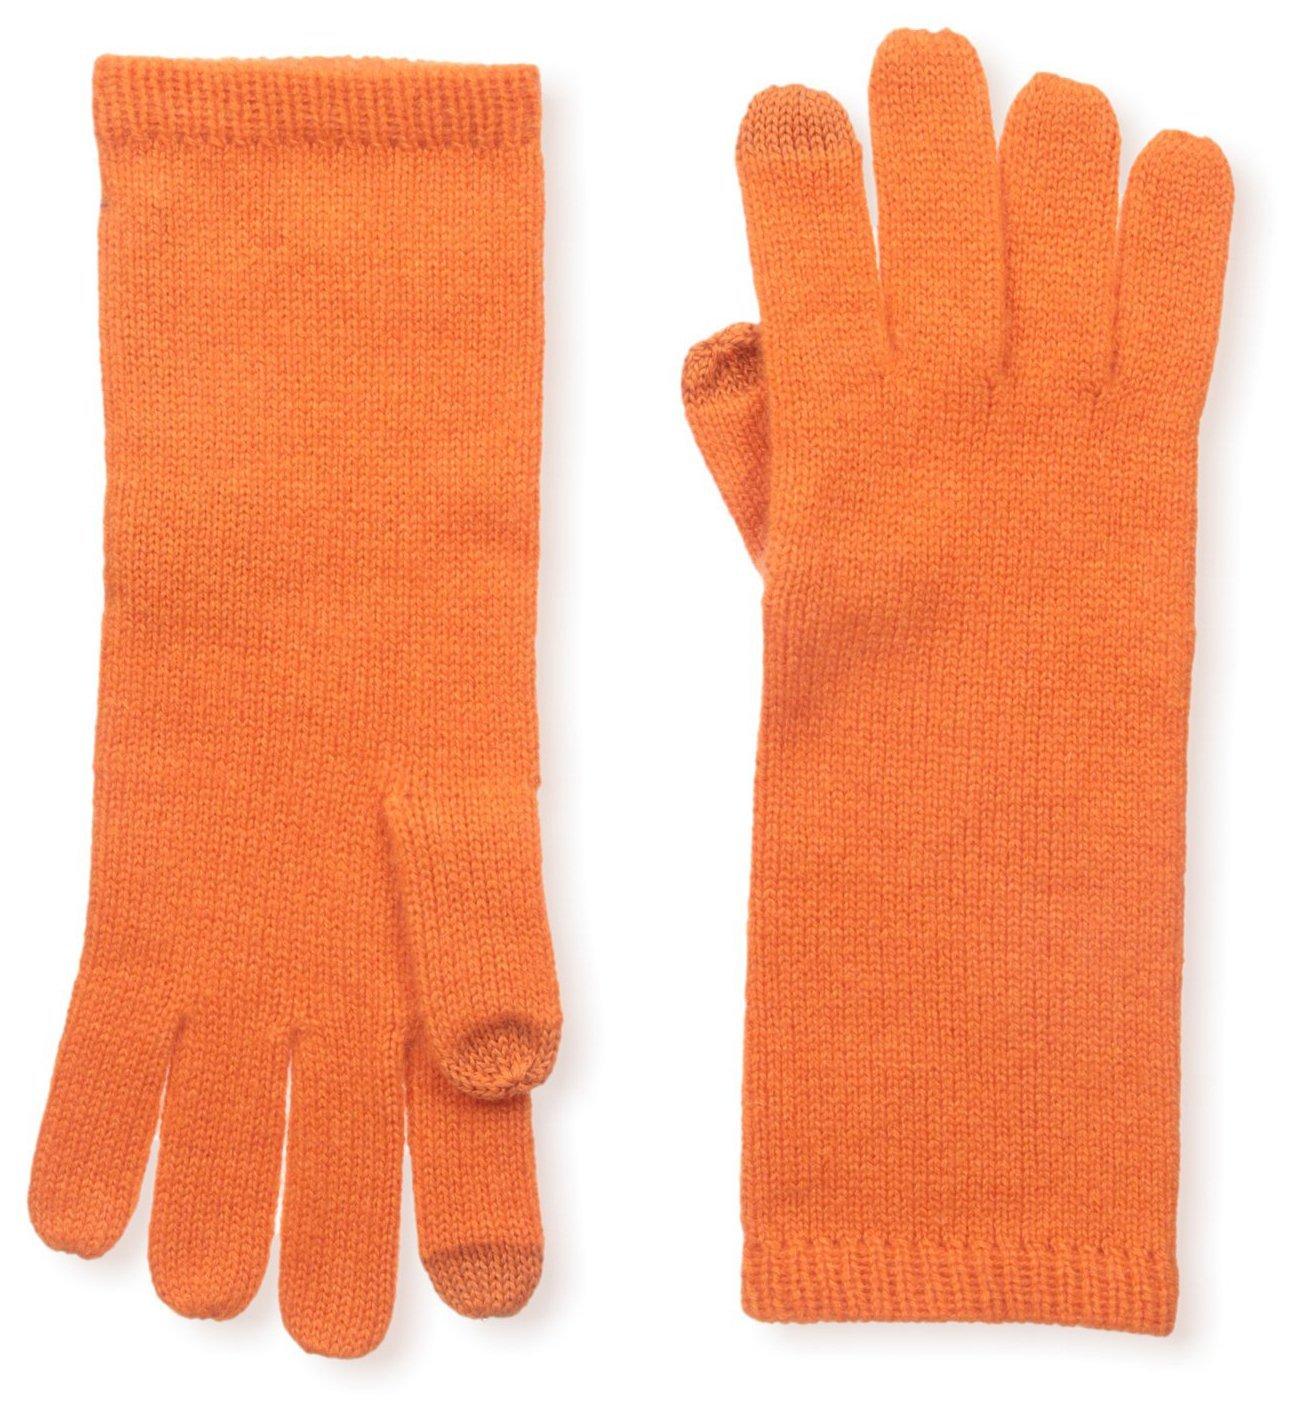 Sofia Cashmere Women's Smartphone Gloves, Orange